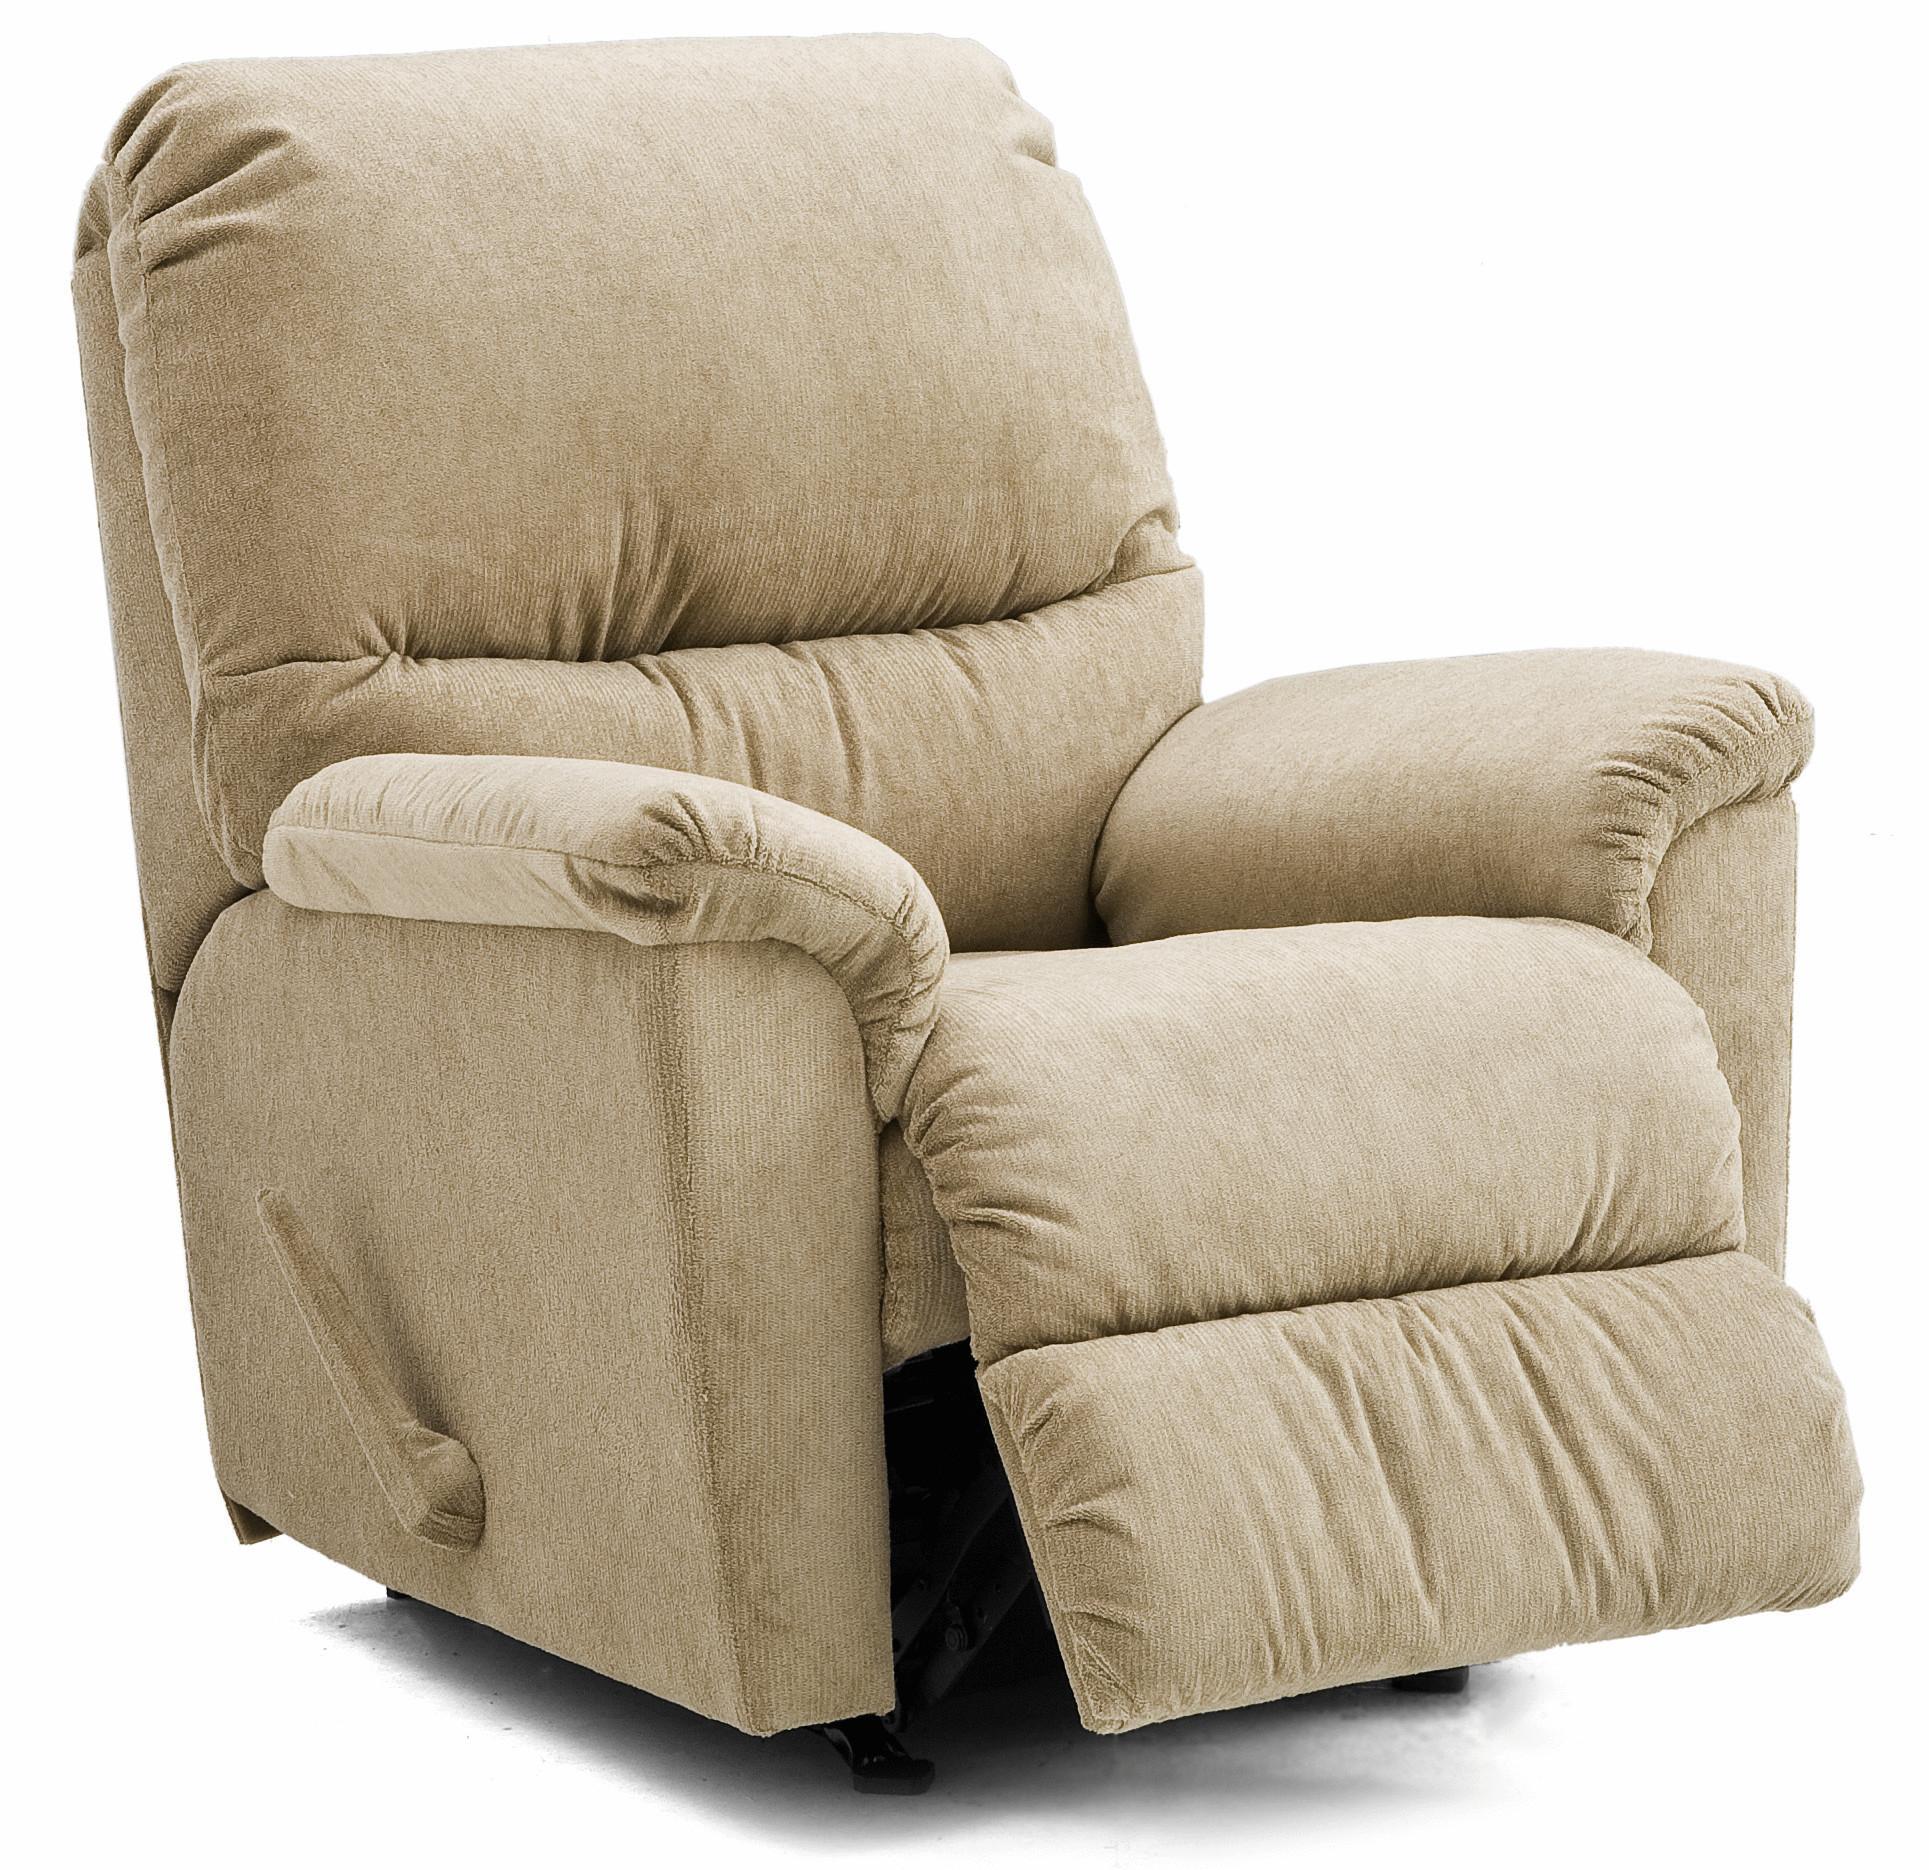 palliser grady casual power lift chair with bustle back ahfa